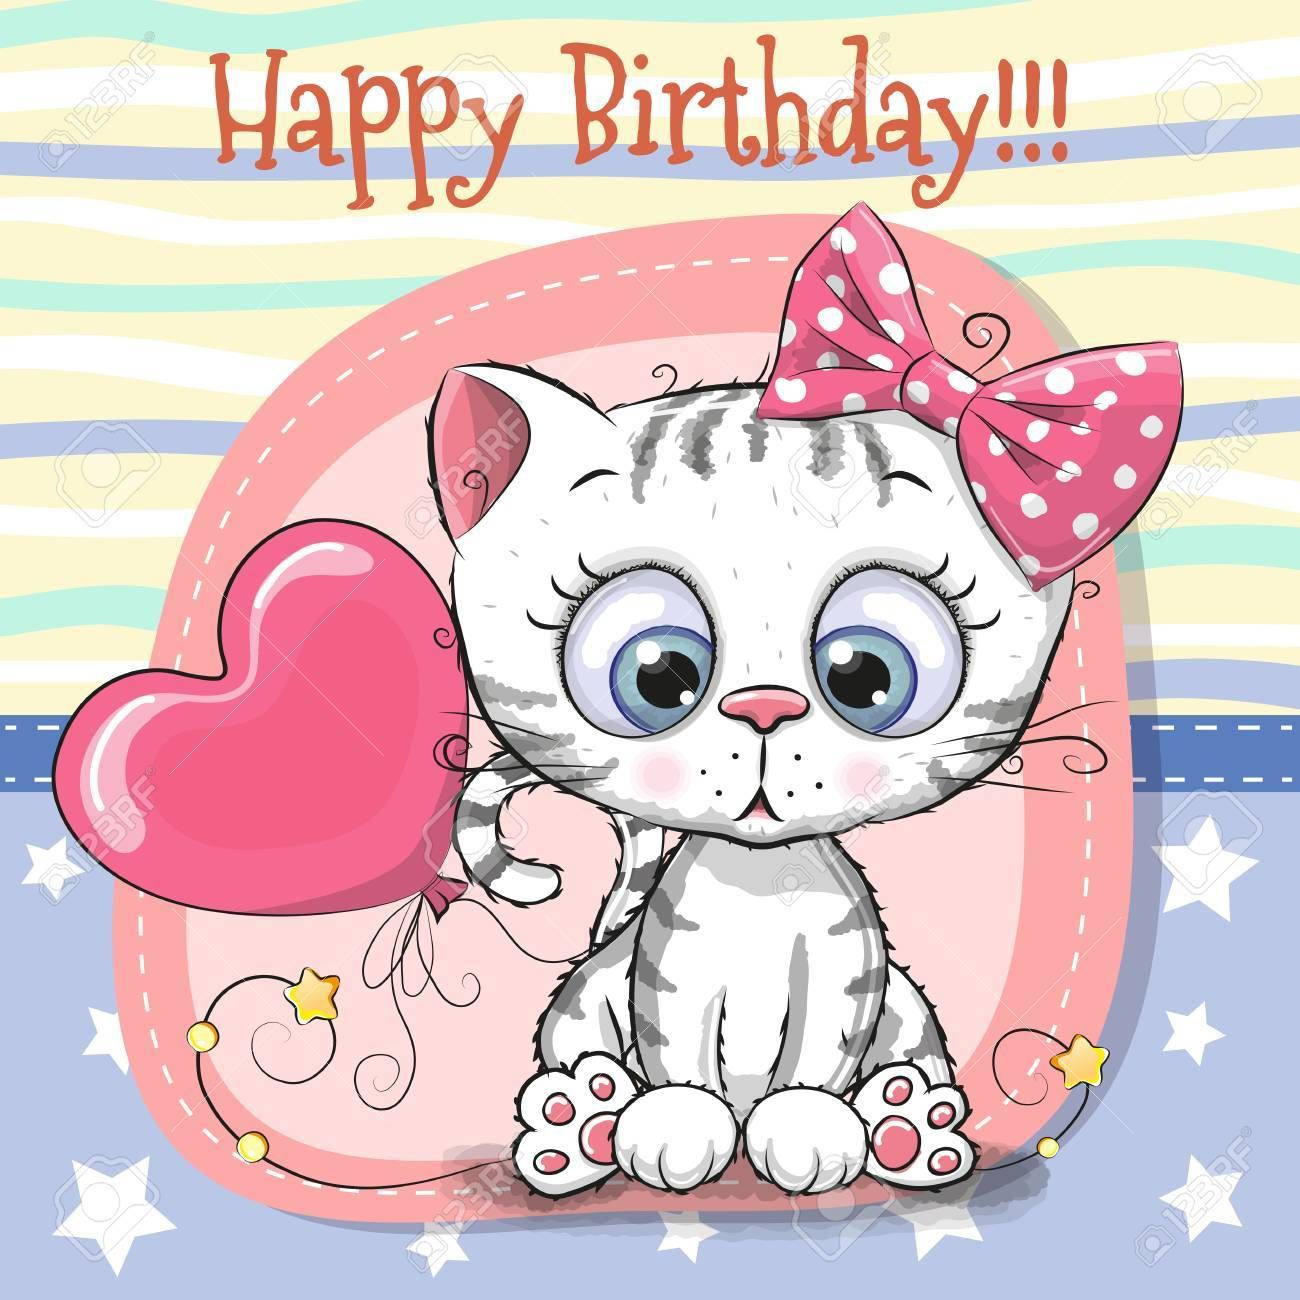 Cute Cartoon Kitten Birthday Greeting Card Illustration Sponsored Kitten Cartoon Cute Birthday Illustration Kitten Cartoon Cute Cartoon Cartoon